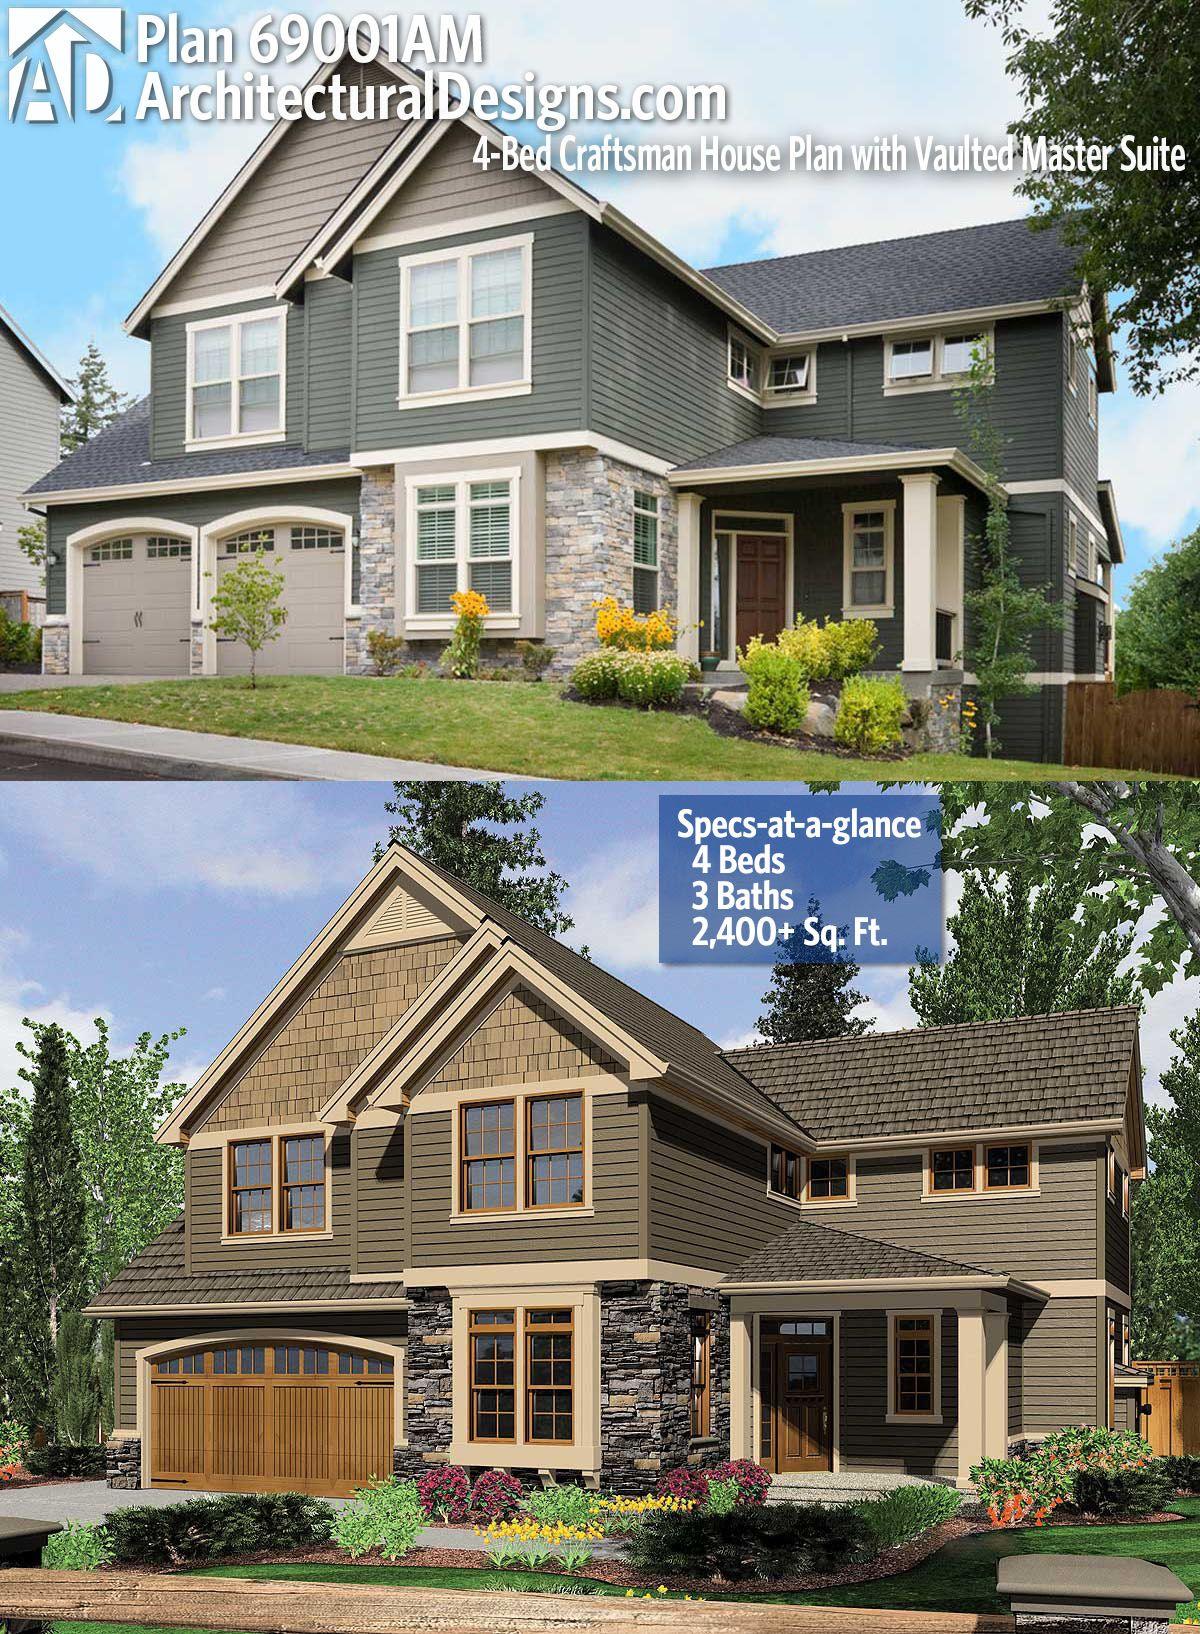 Architectural Designs Craftsman House Plan 69001AM